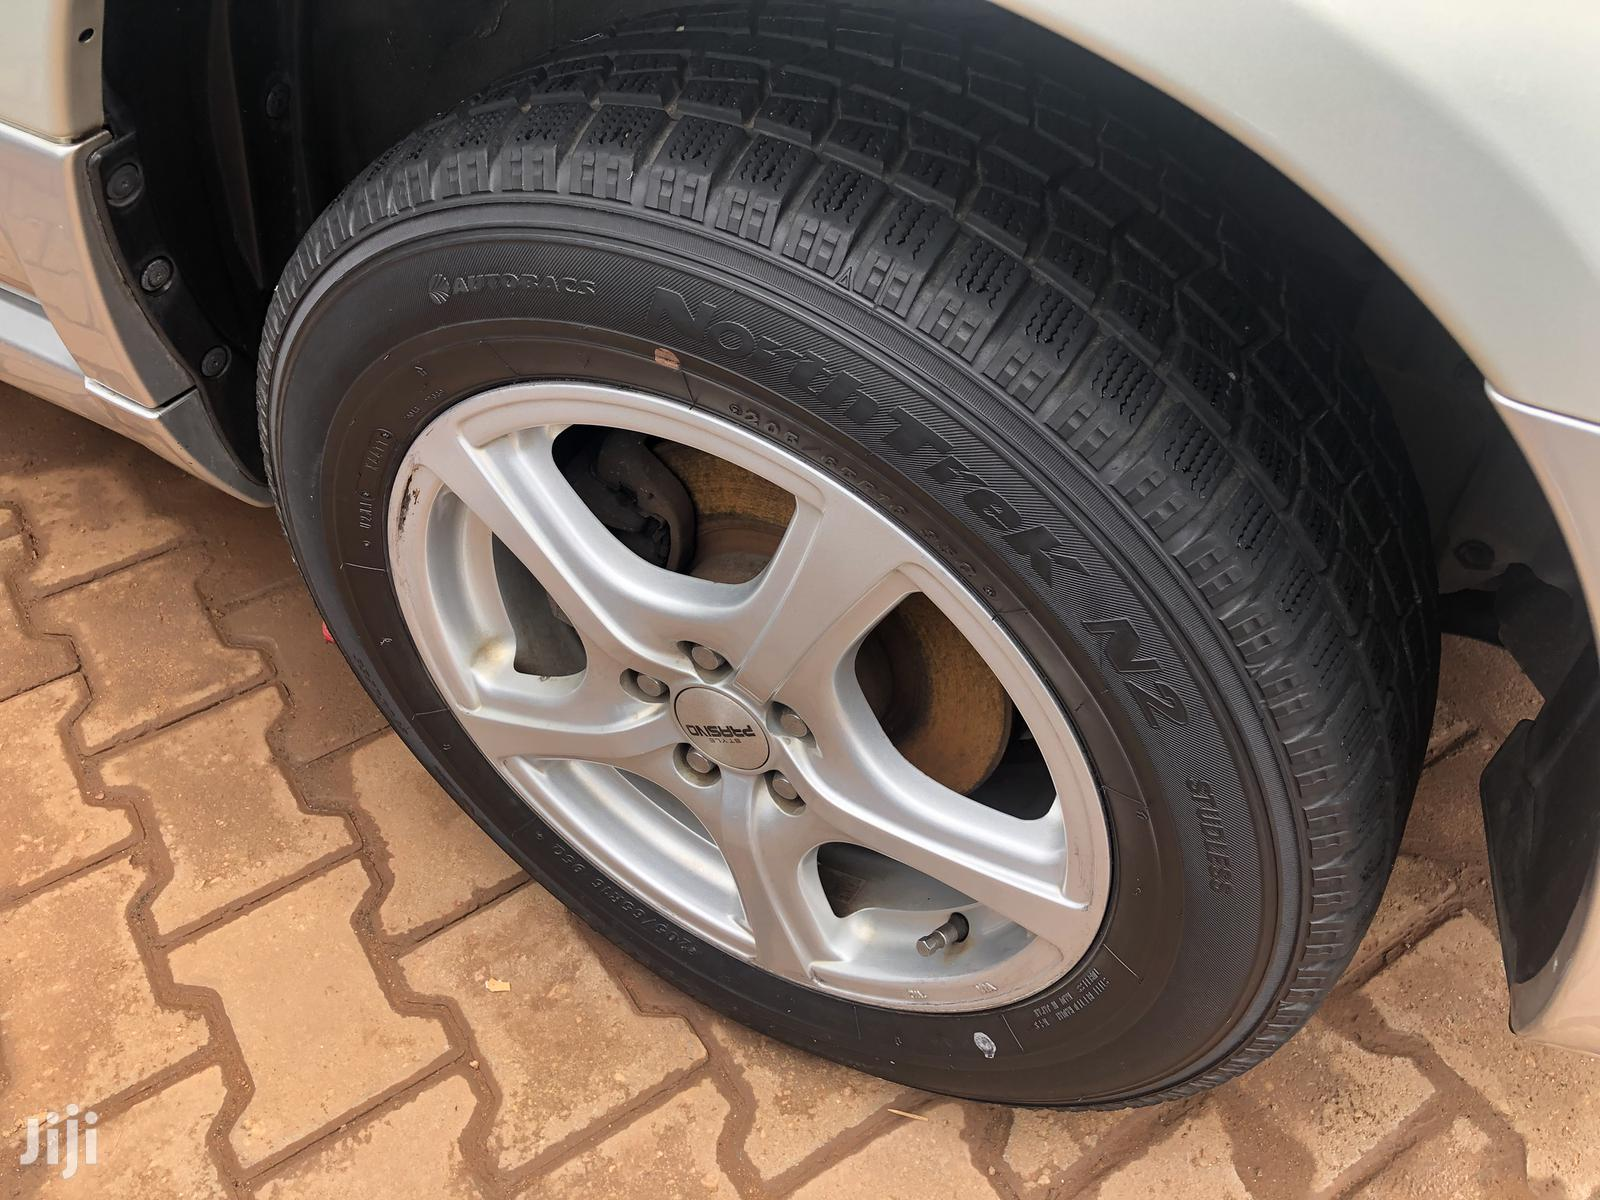 Subaru Forester 2006 Beige | Cars for sale in Kampala, Central Region, Uganda